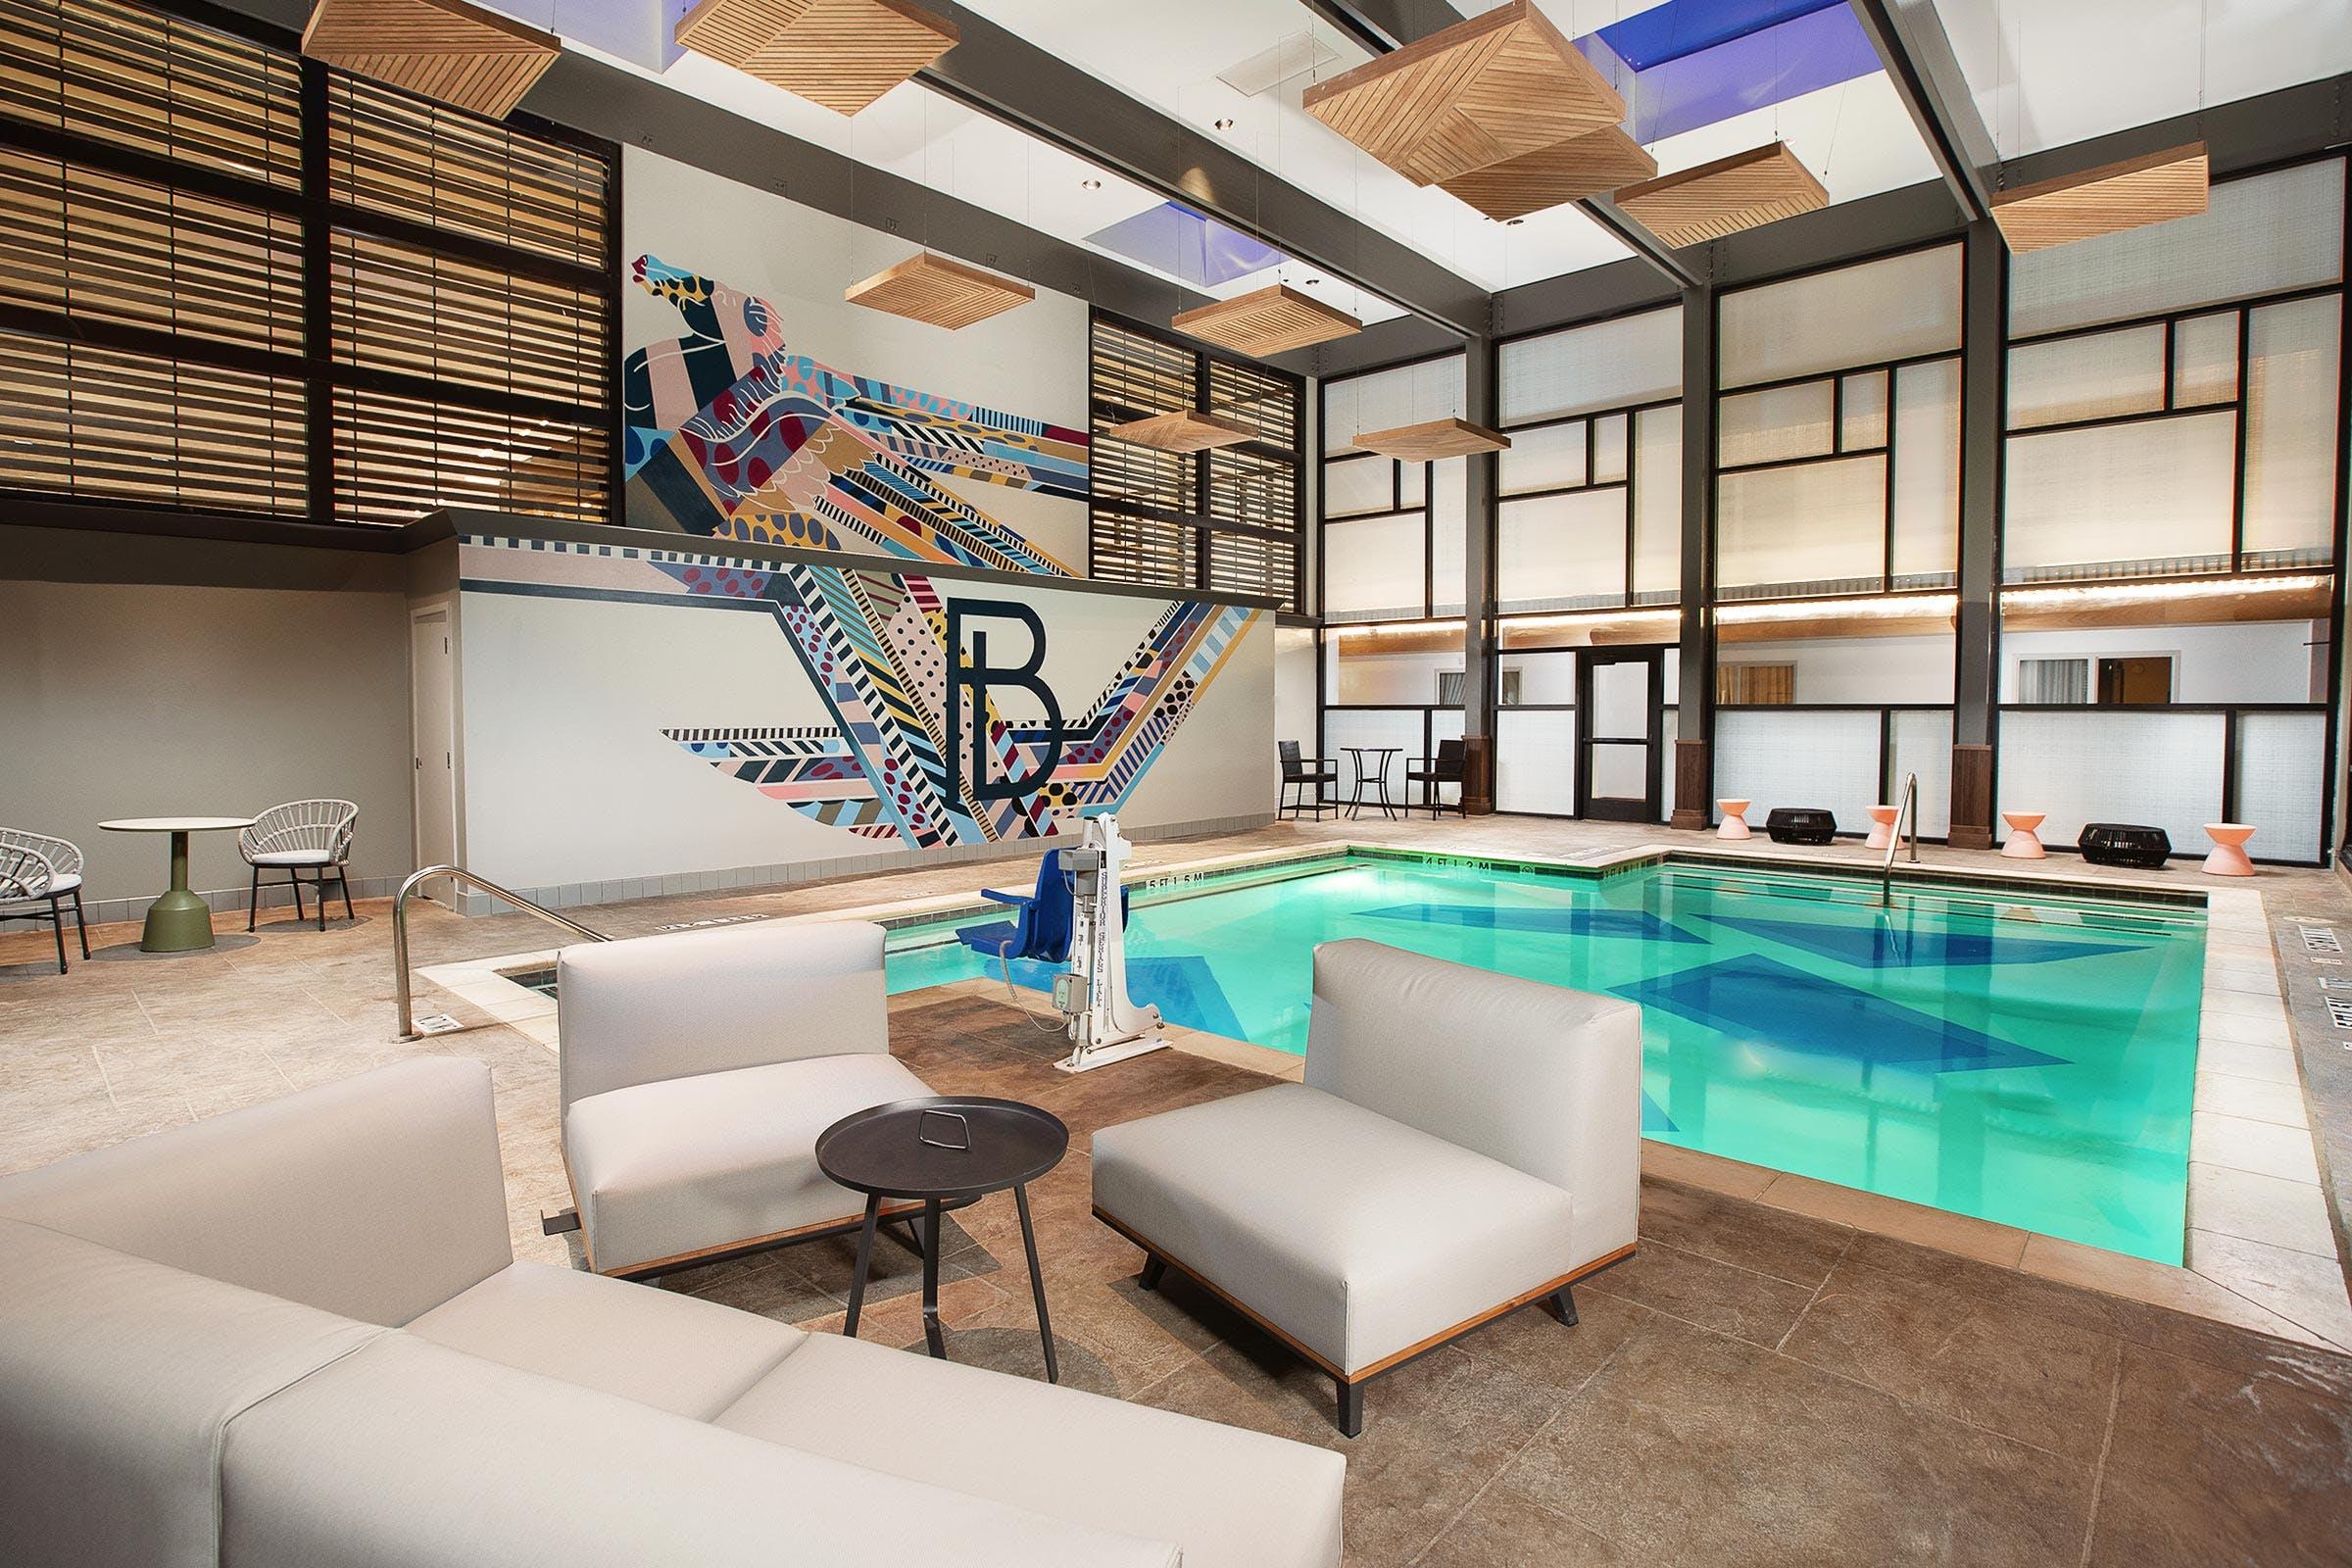 beeman-hotel-pool